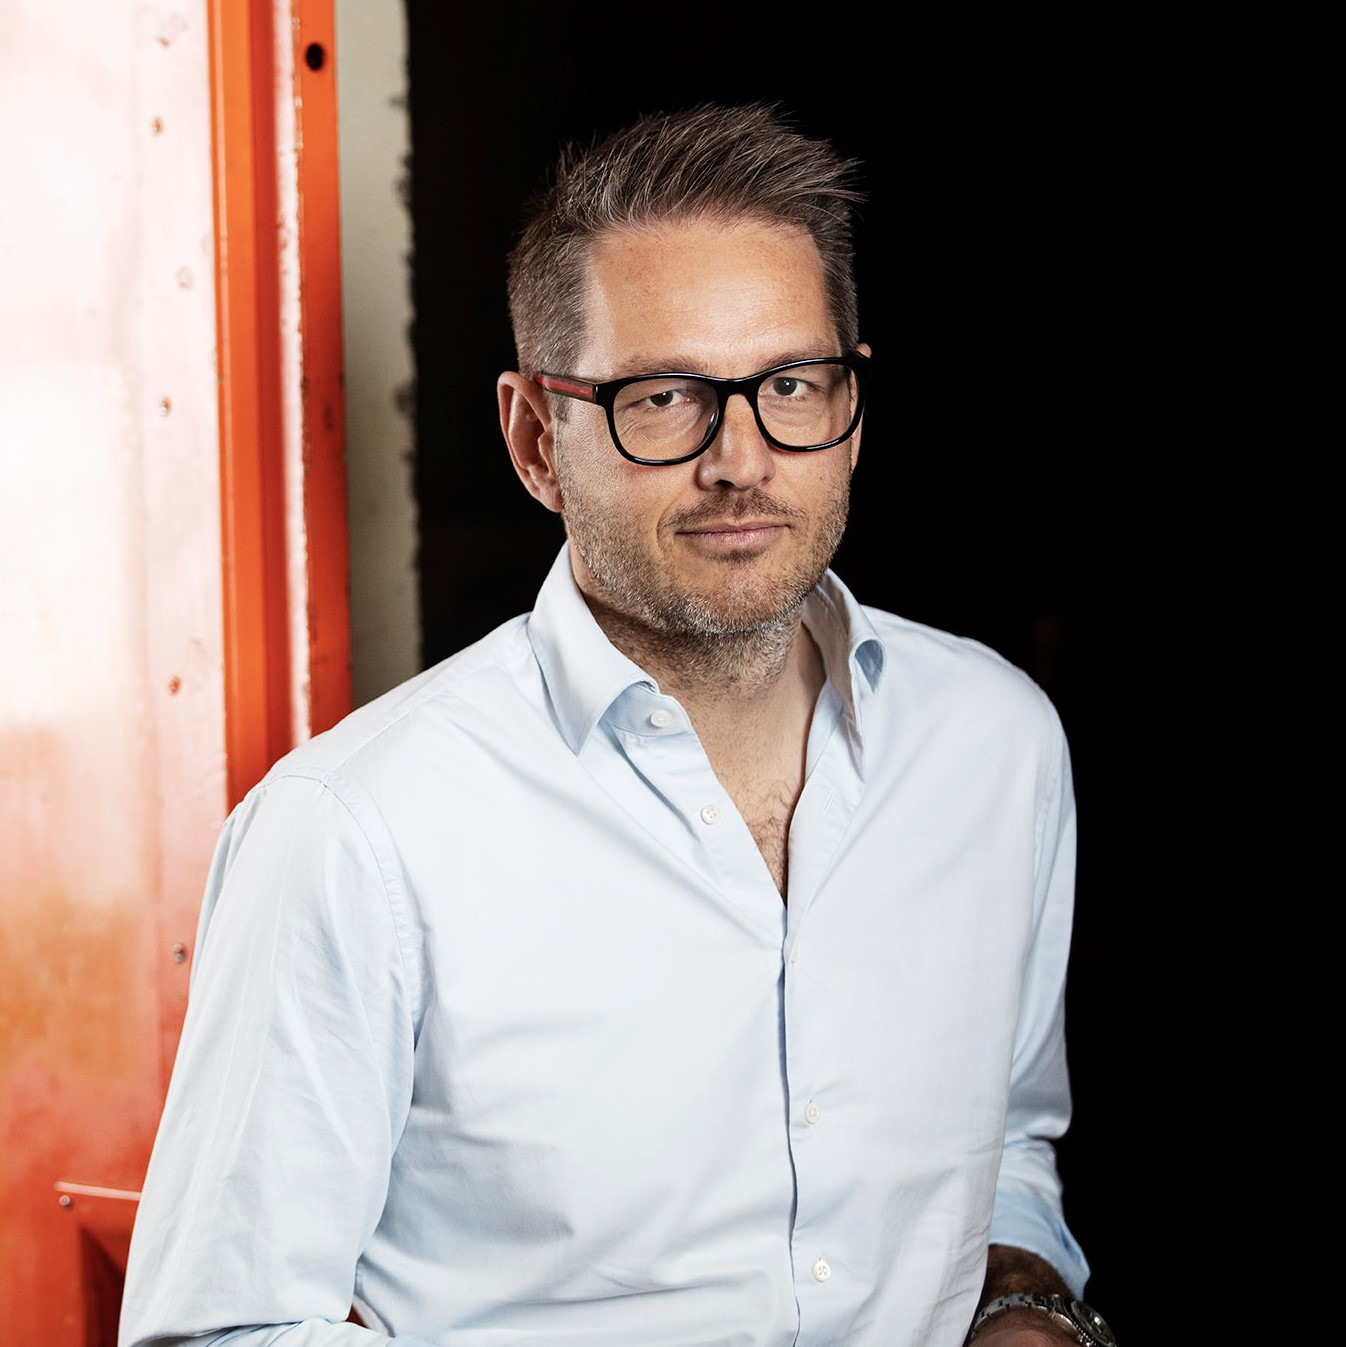 Carl Johan Paulsen